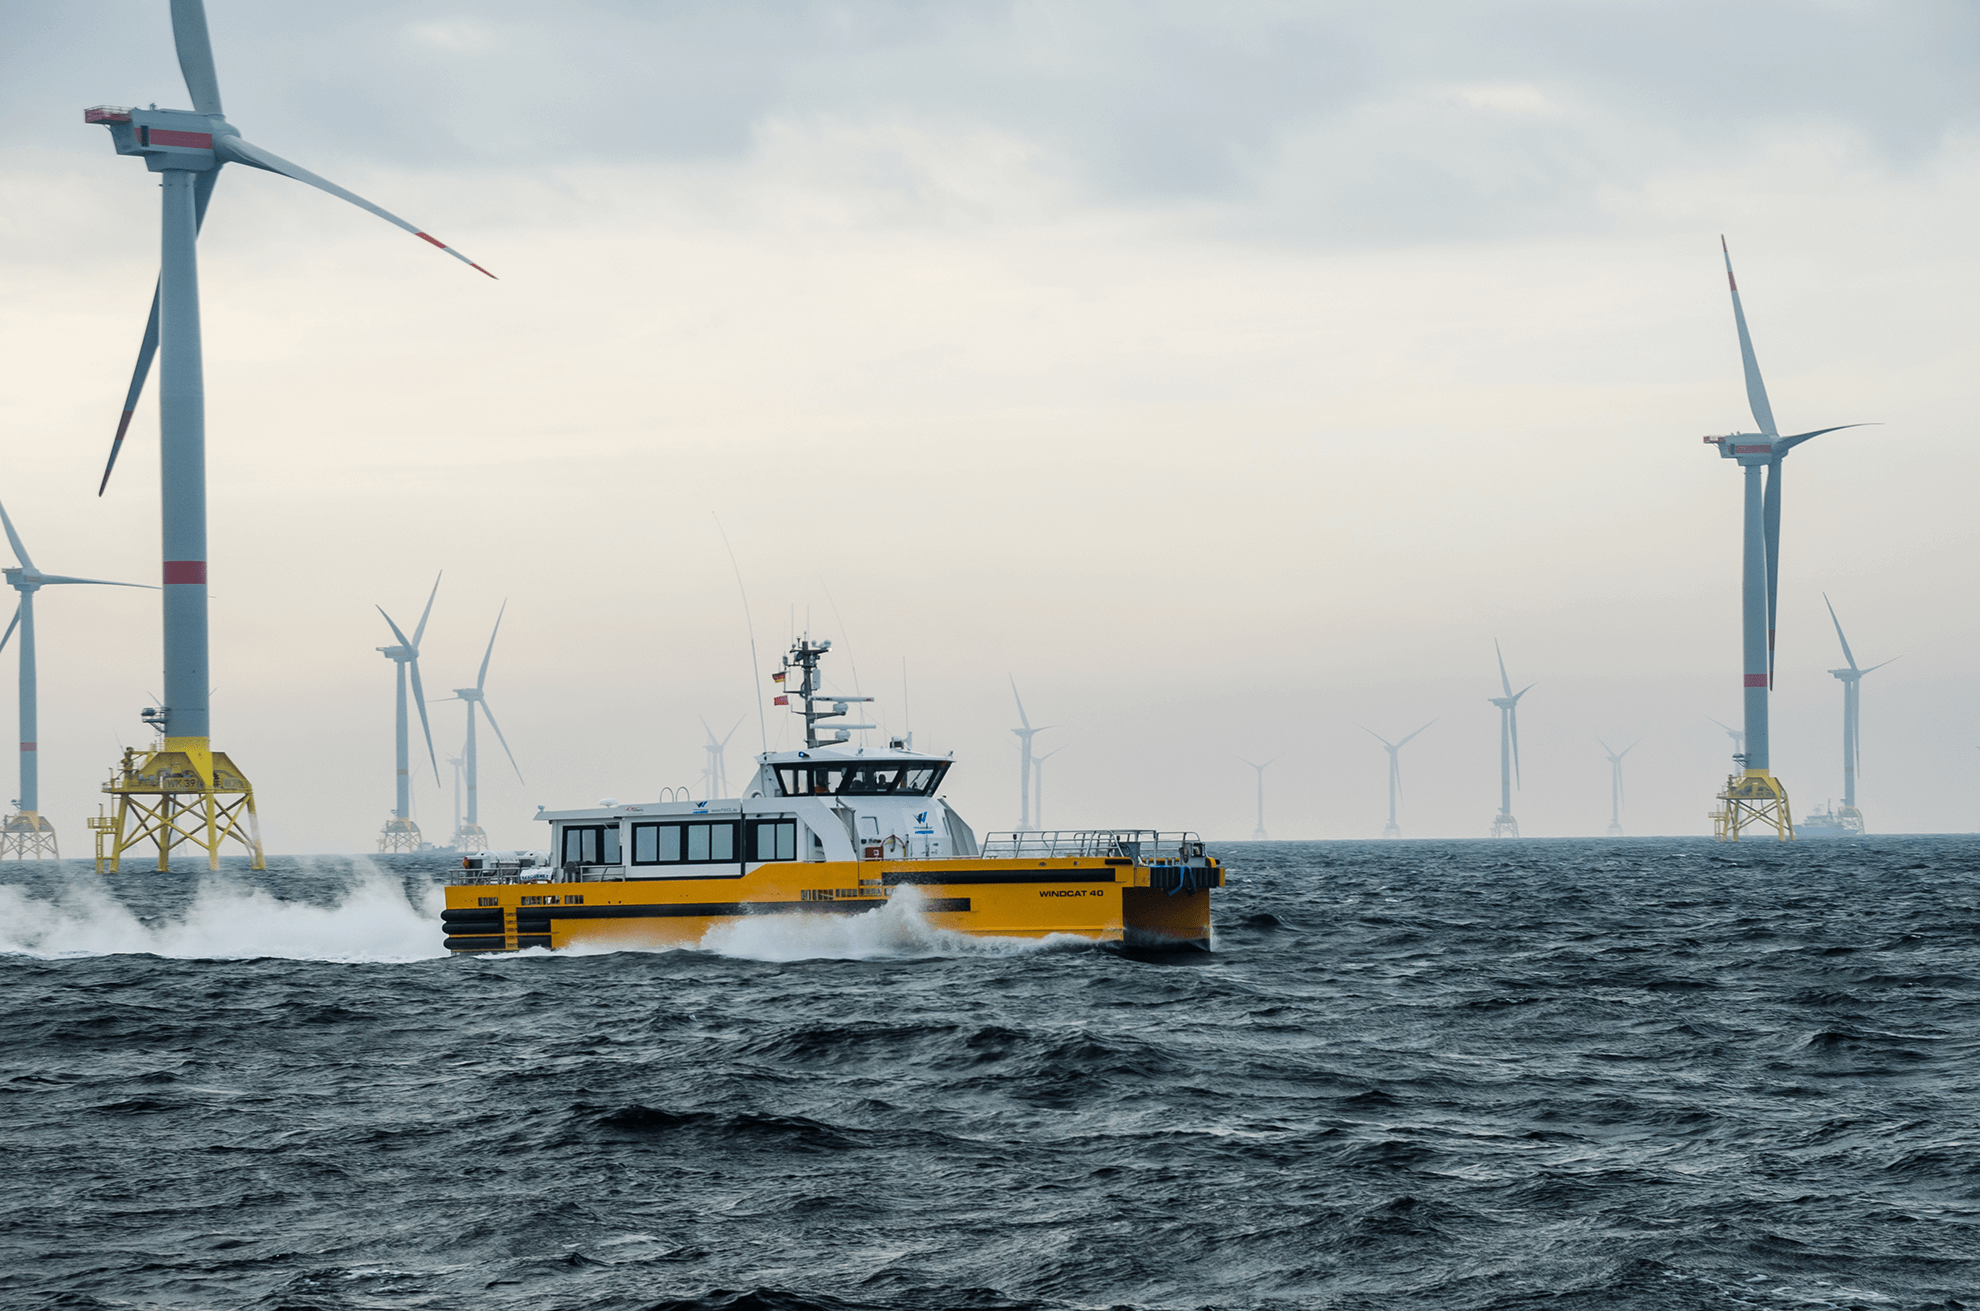 Holland-composites-lightweigh-deckhouse-composite-maritime-manufacturer-shipbuilding-reducing-weight-reduction-shipyard-boat-builder-building-company